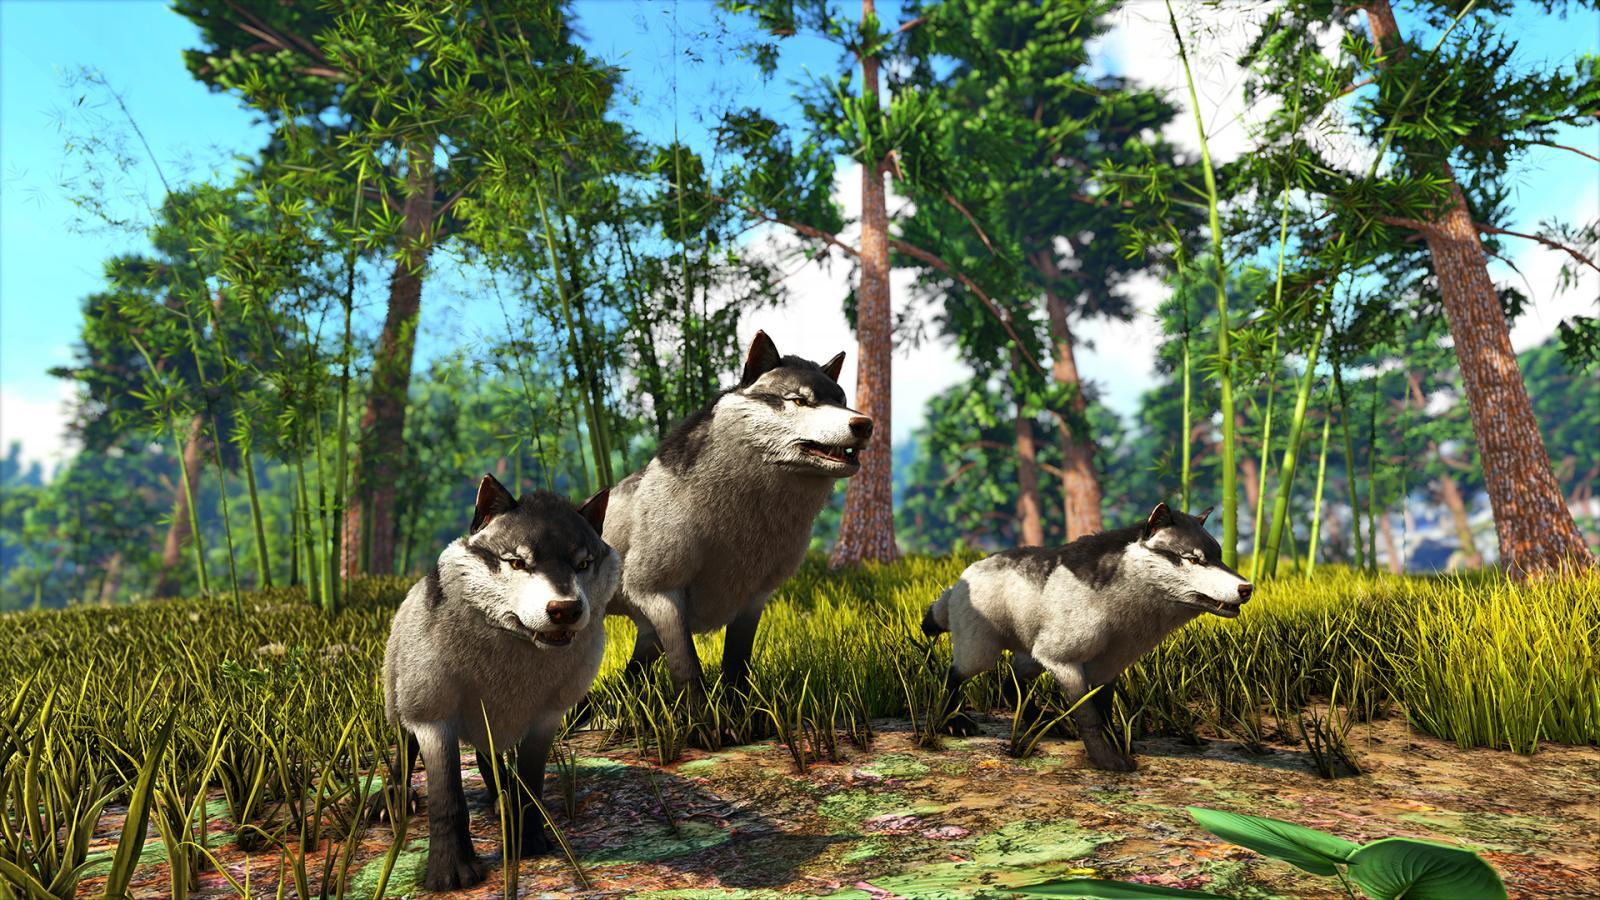 large.5a8b605fd856e_WolfAmaterasu-CuteDirewolves-8x.jpg